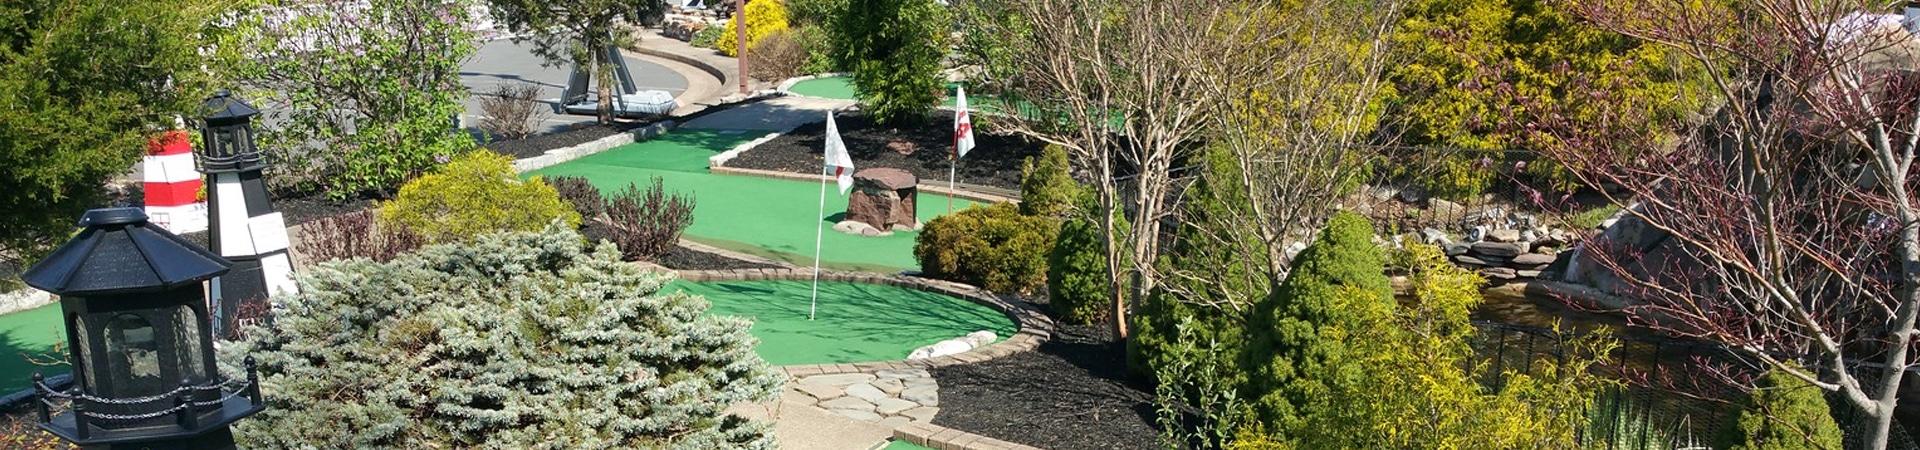 miniature golf mania dulles golf center u0026 sports park